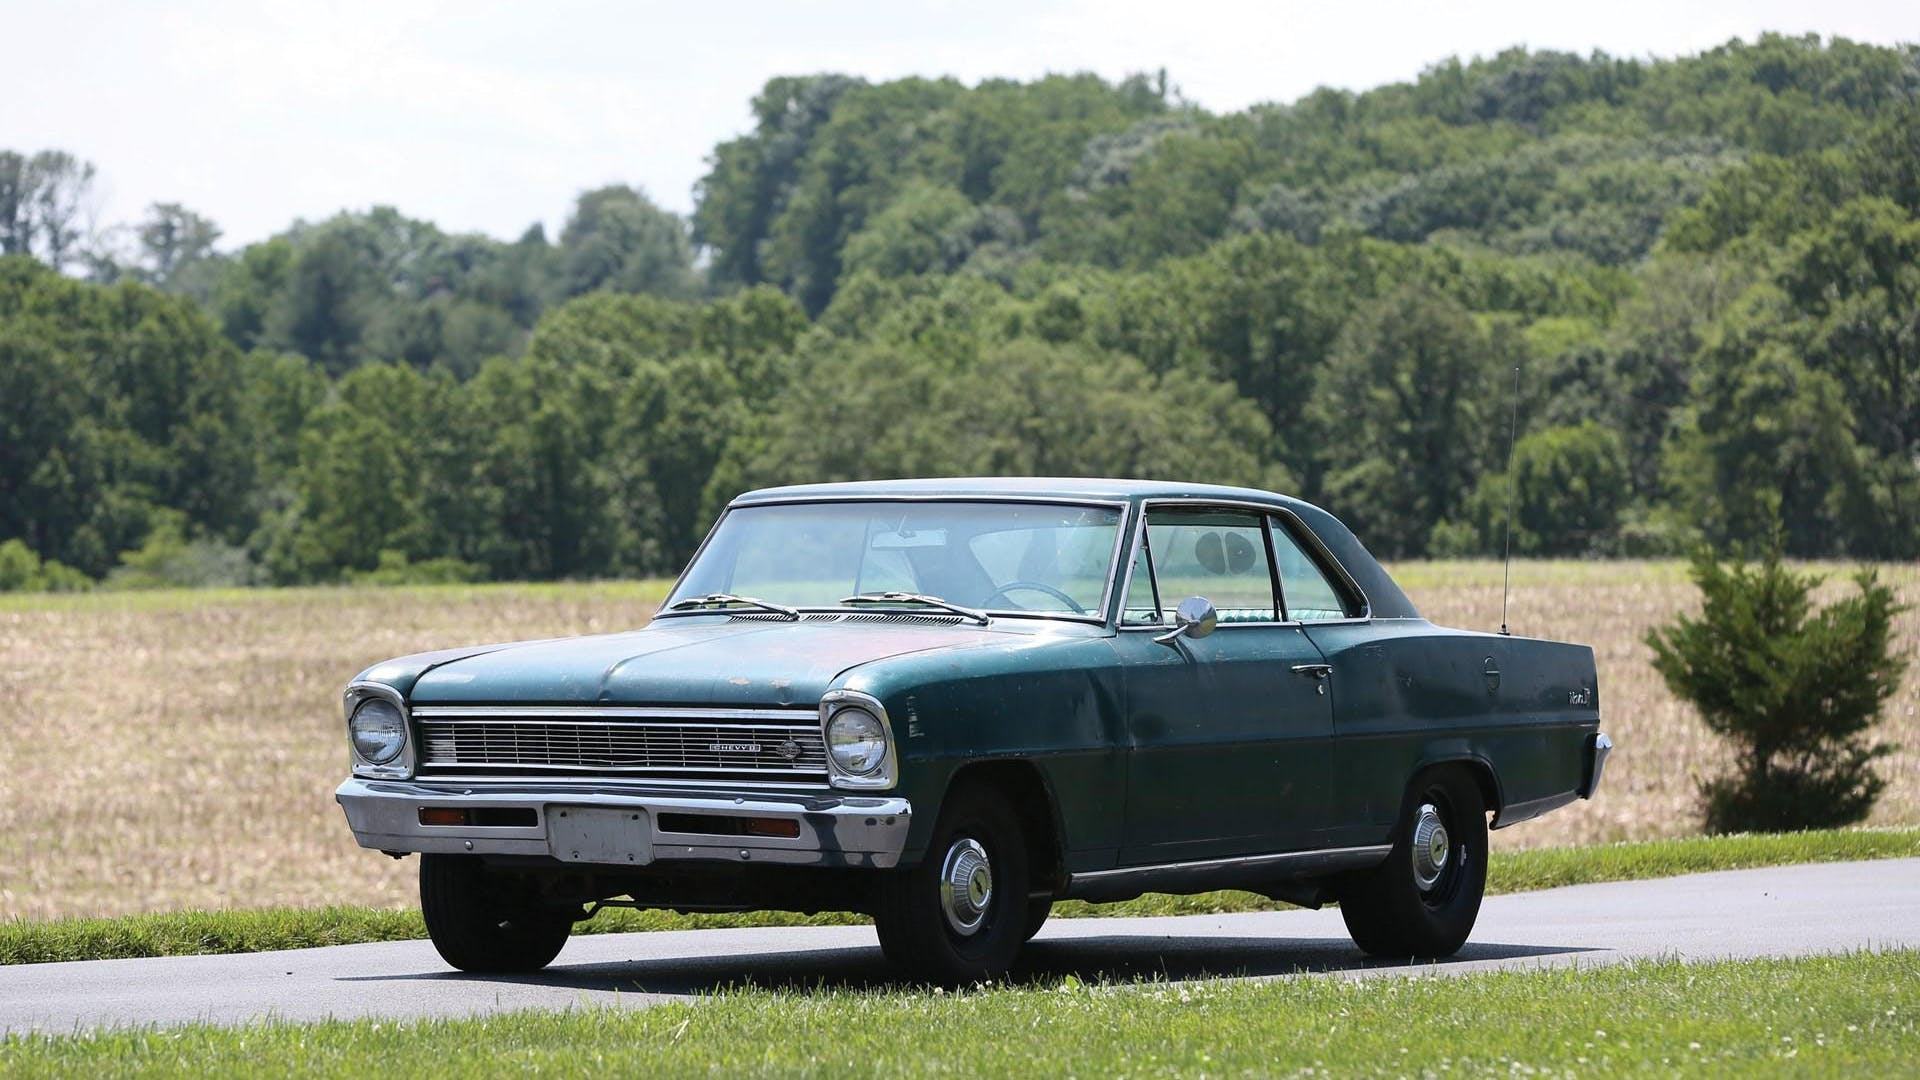 1966 Chevrolet Chevy II Nova L79